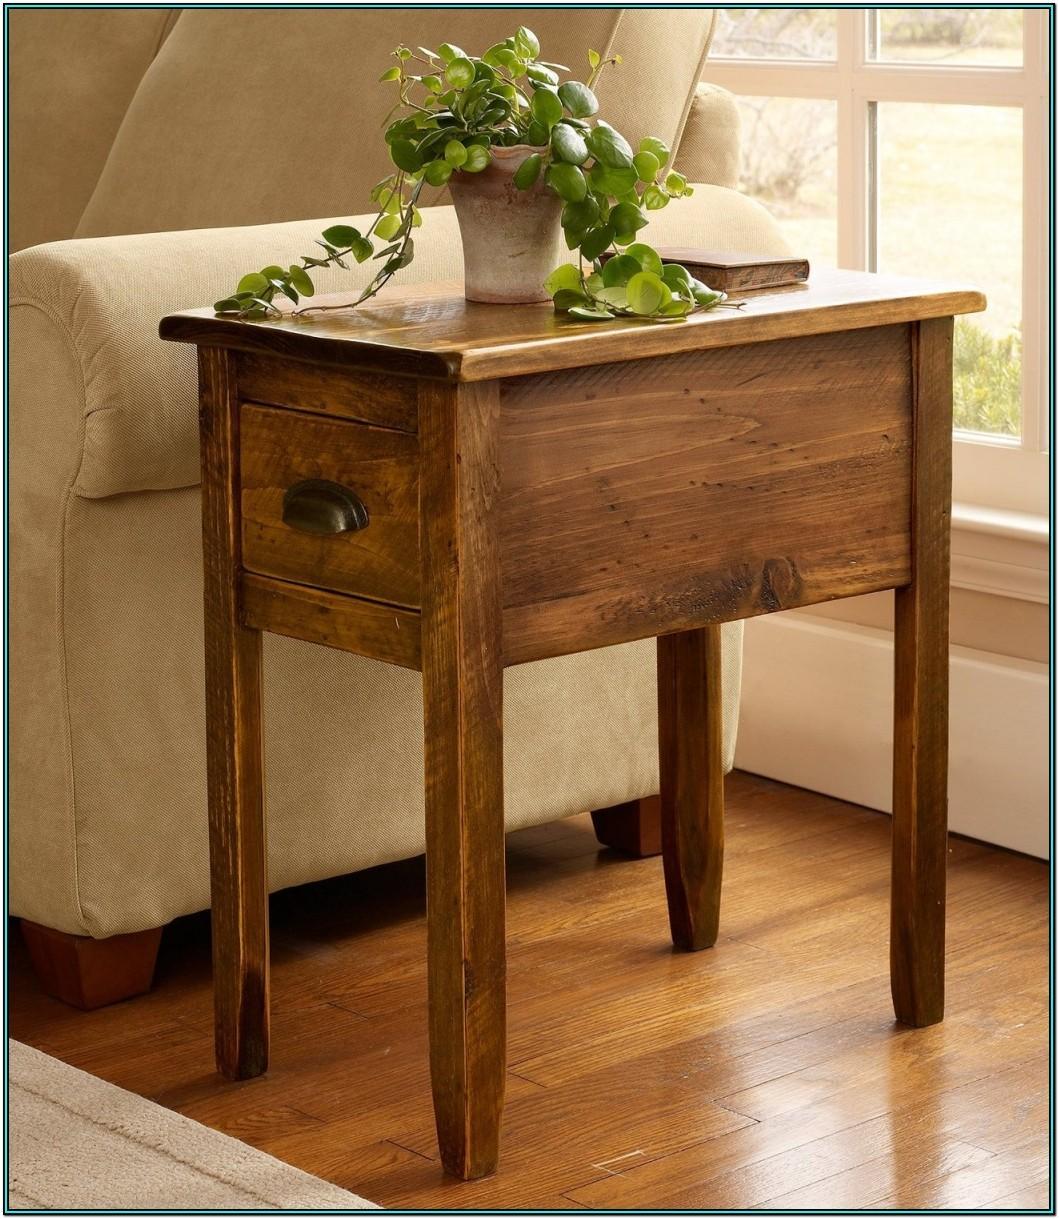 Living Room Storage Side Table